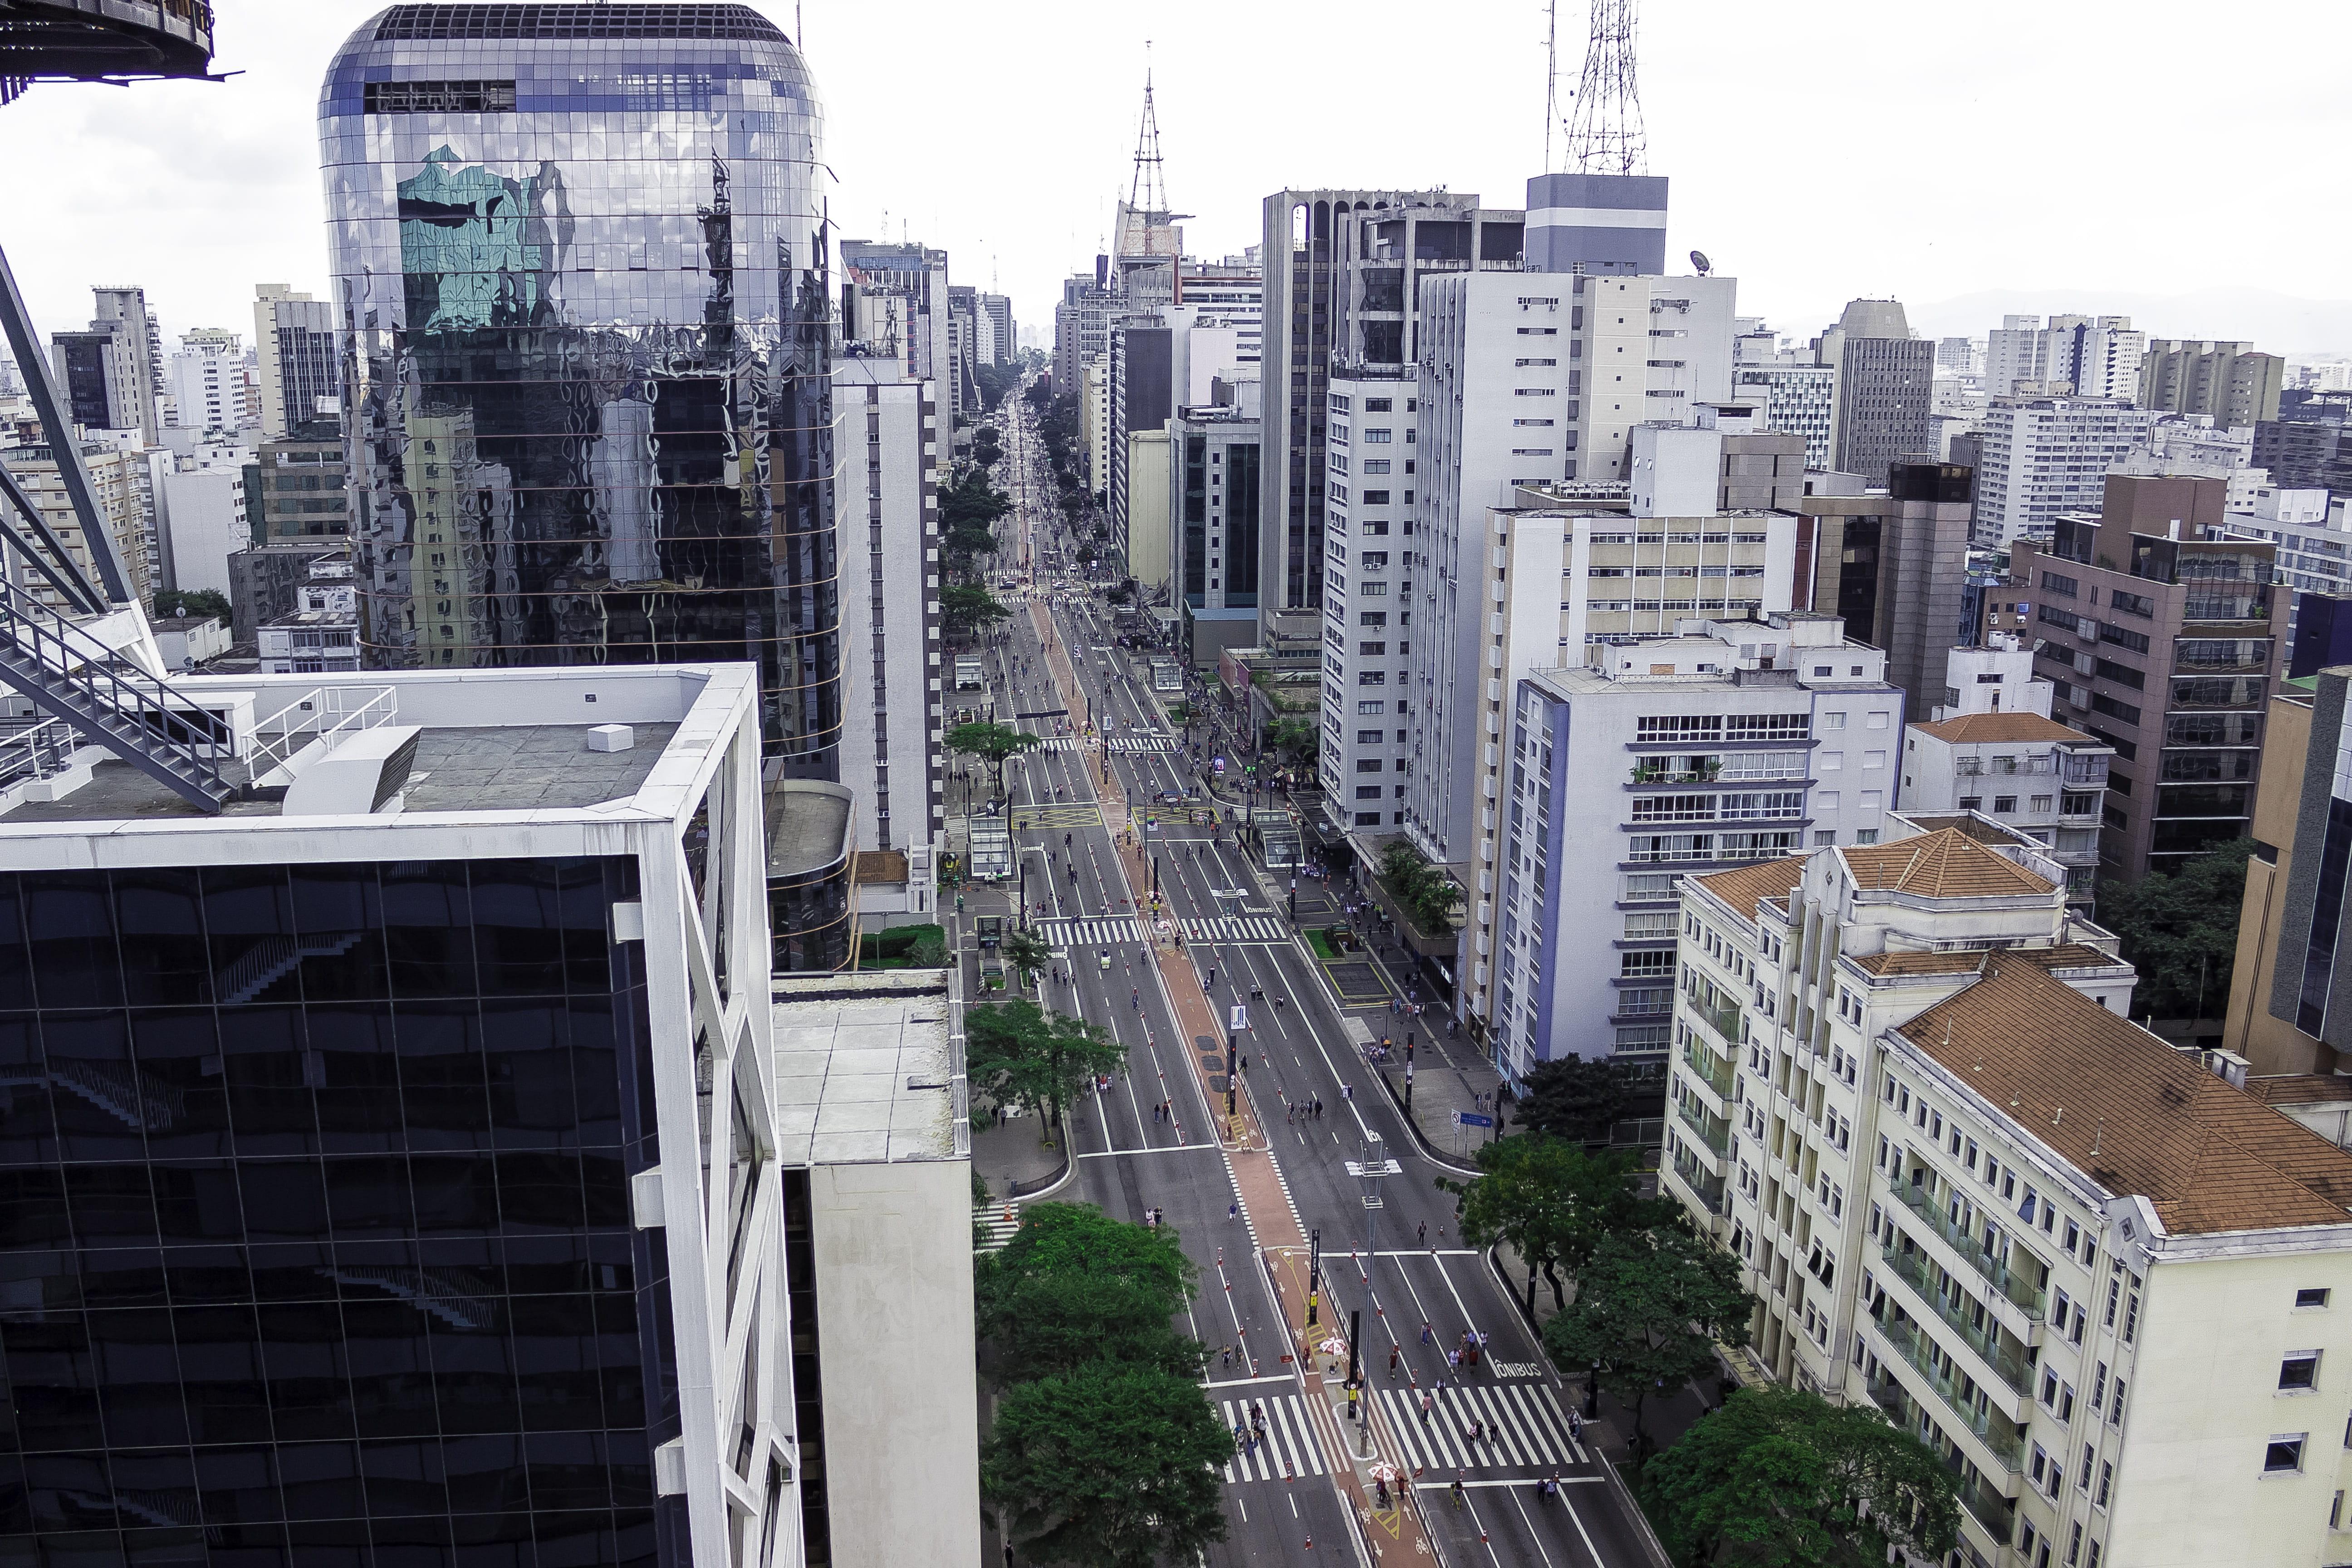 Didi Chuxing, WhatsApp Partner for Ride-Hailing in Brazil